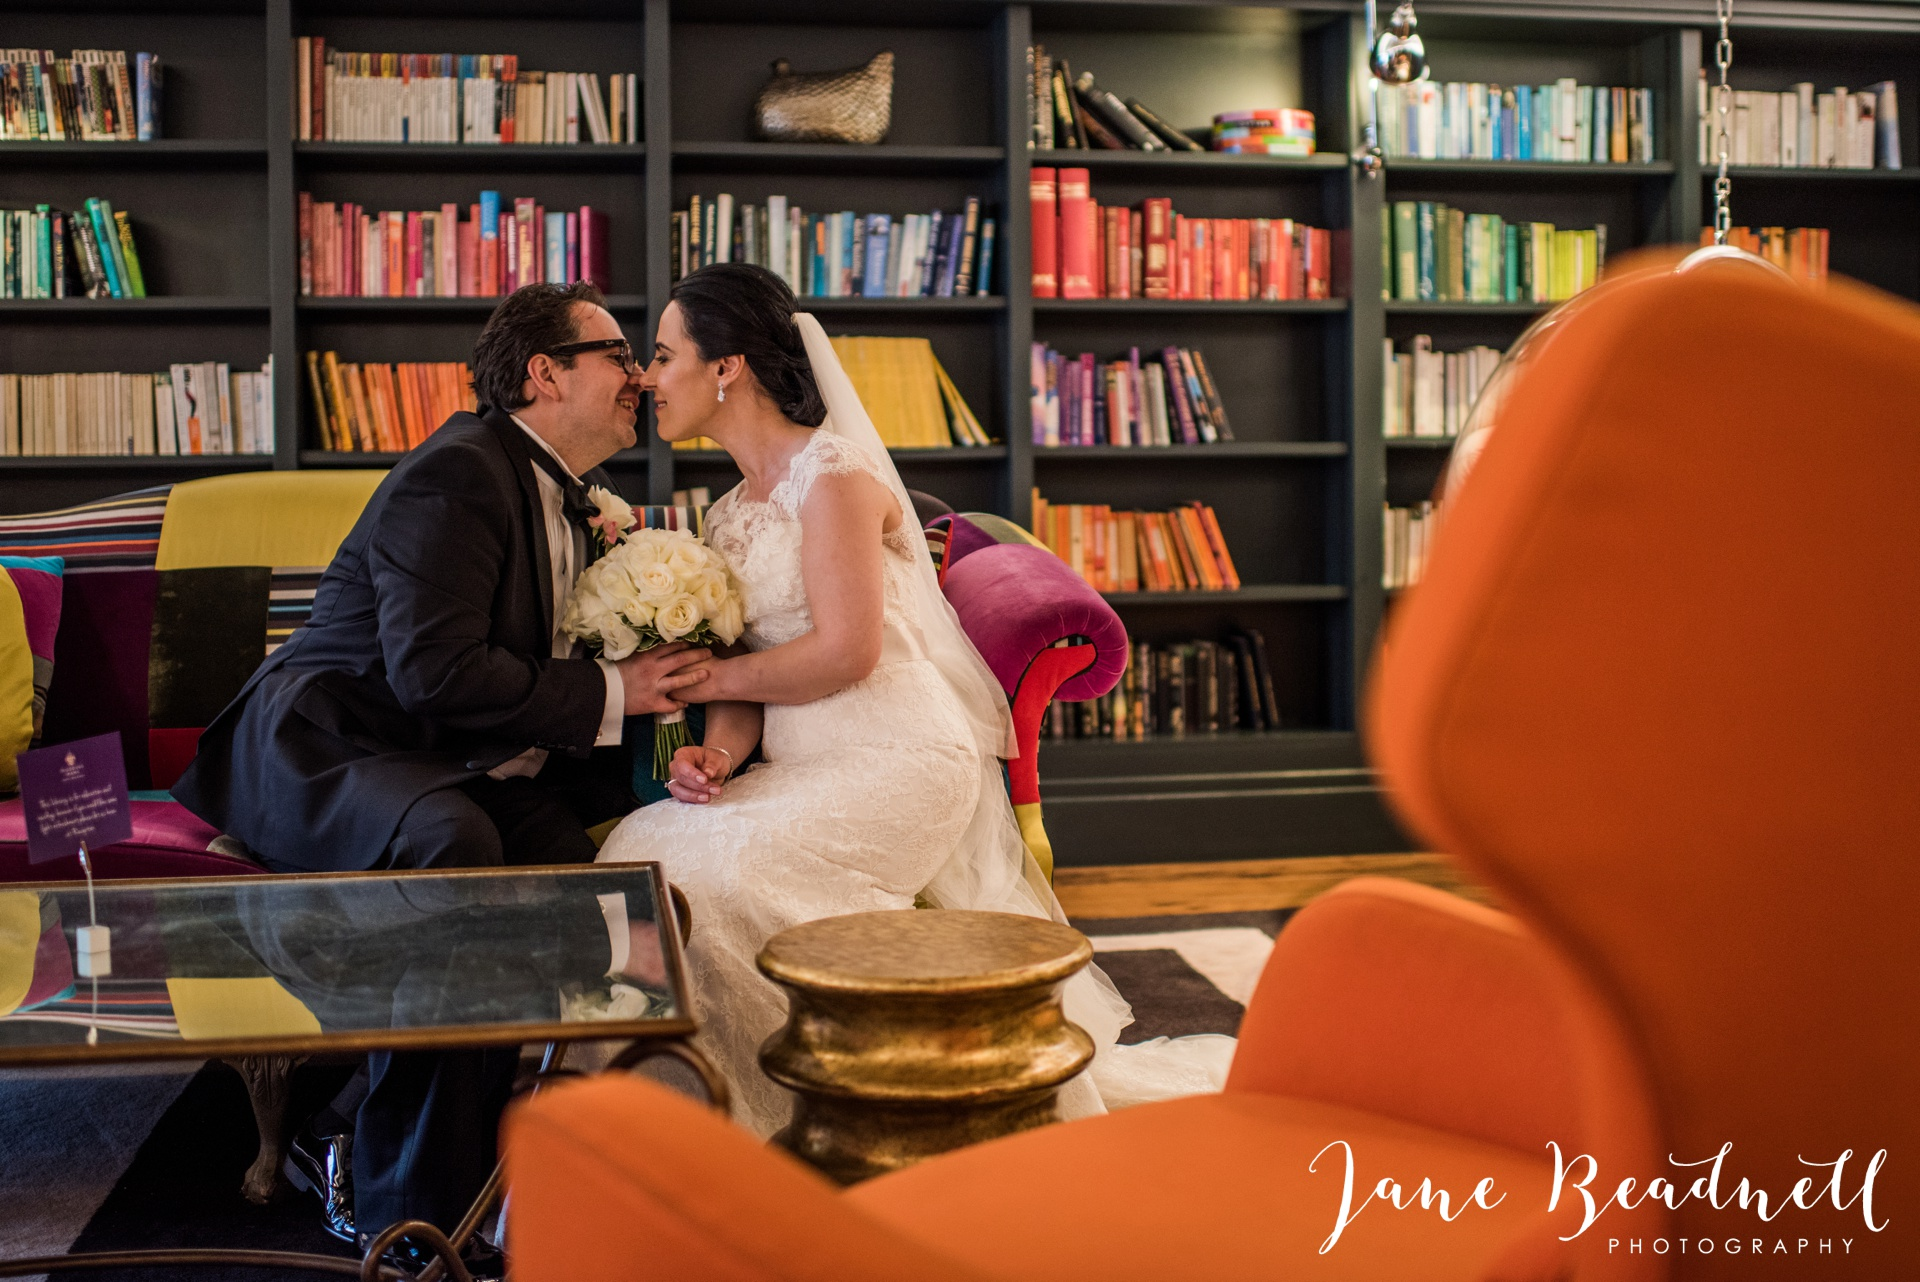 Jane Beadnell fine art wedding photographer Rudding Park Harrogate_0041